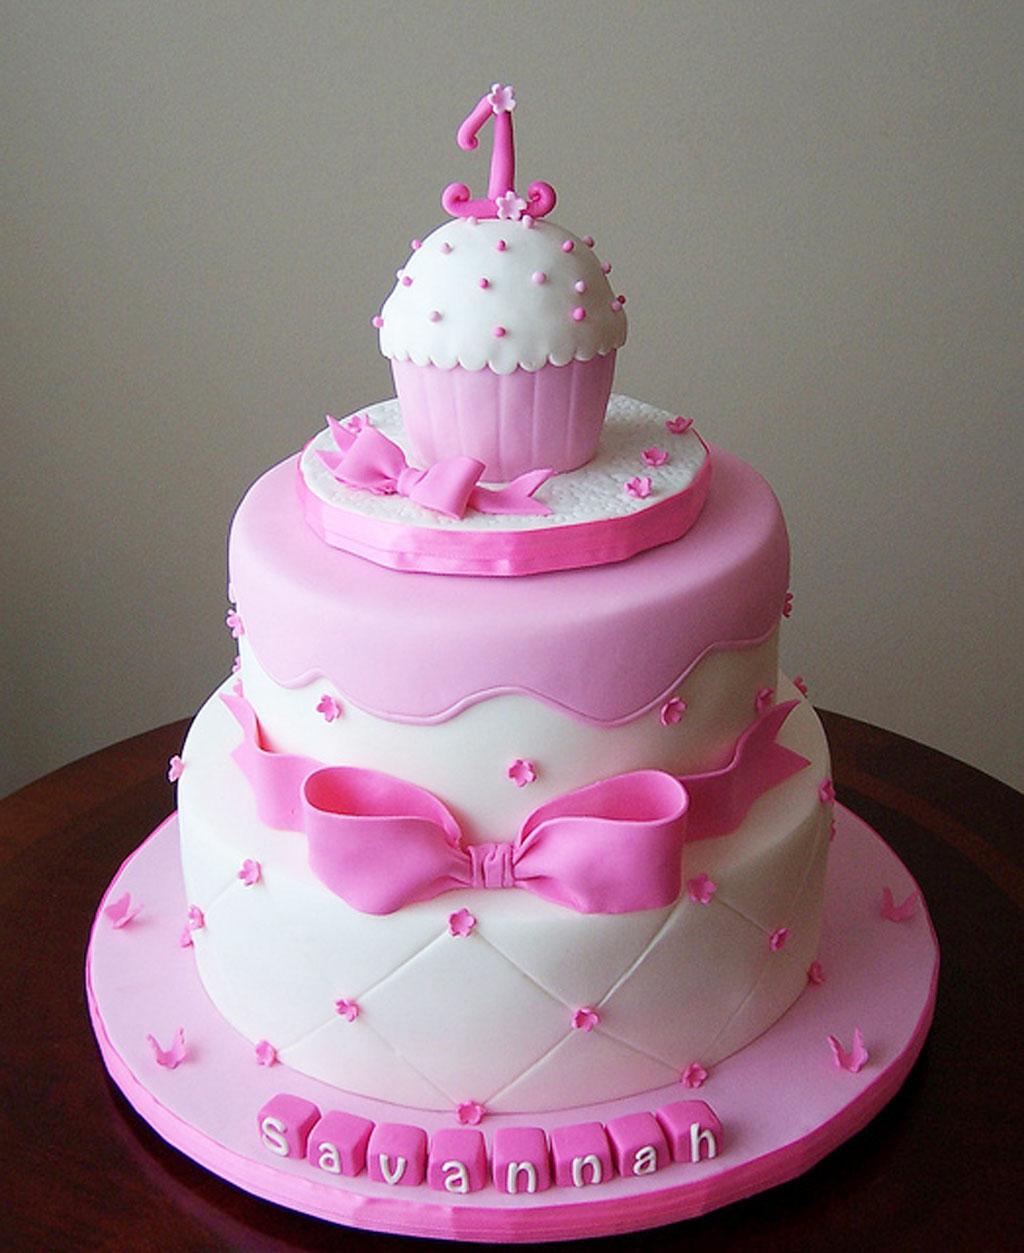 Remarkable 9 Girl First Birthday Cupcakes Photo Pink 1St Birthday Cake Funny Birthday Cards Online Alyptdamsfinfo